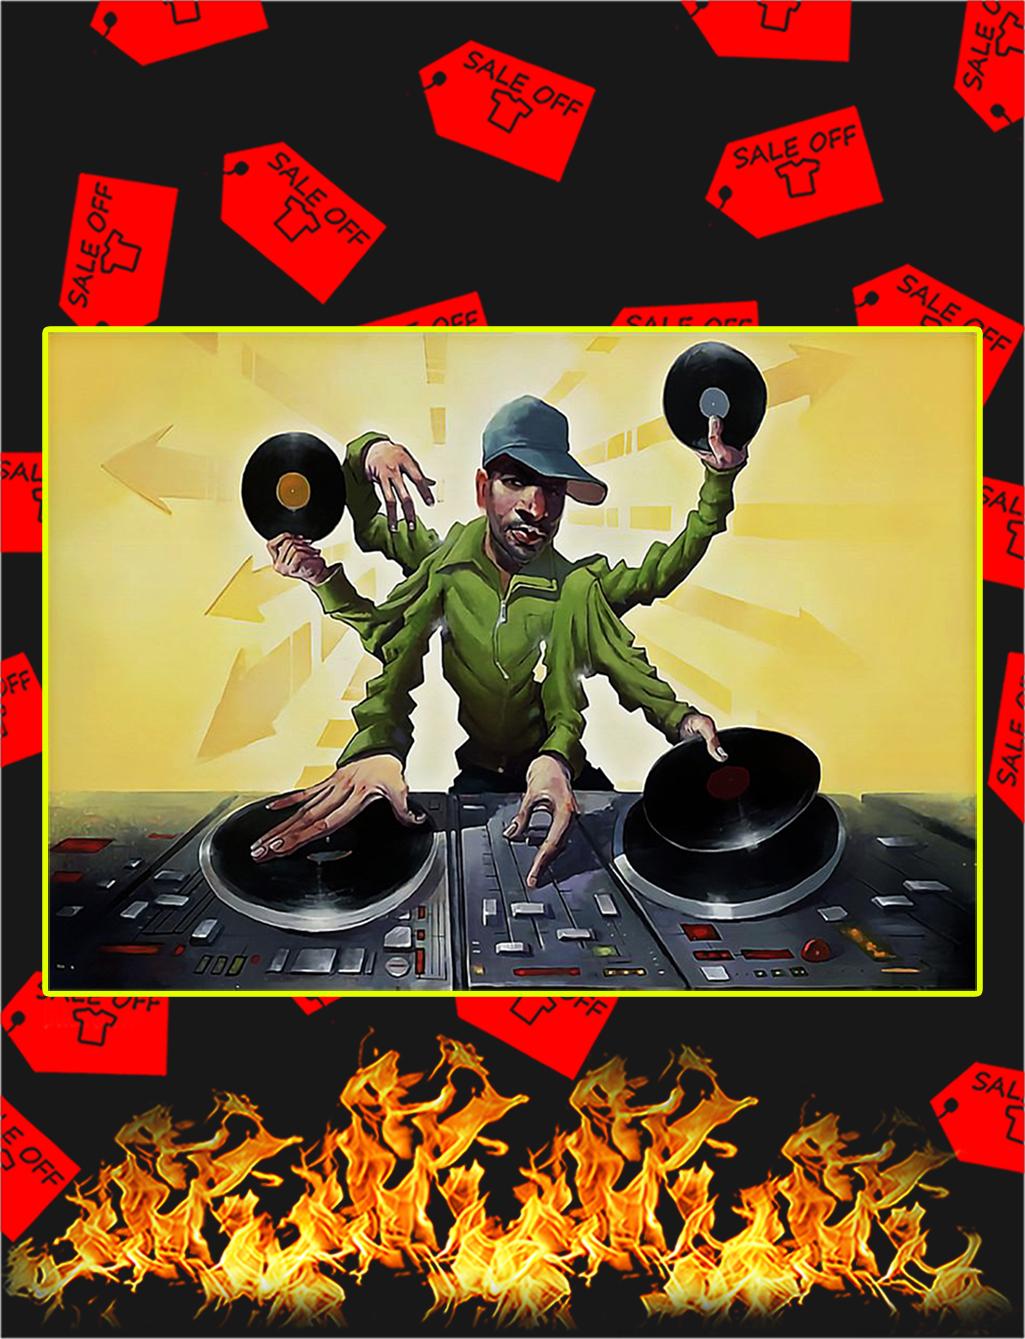 DJ master mixing poster - A2